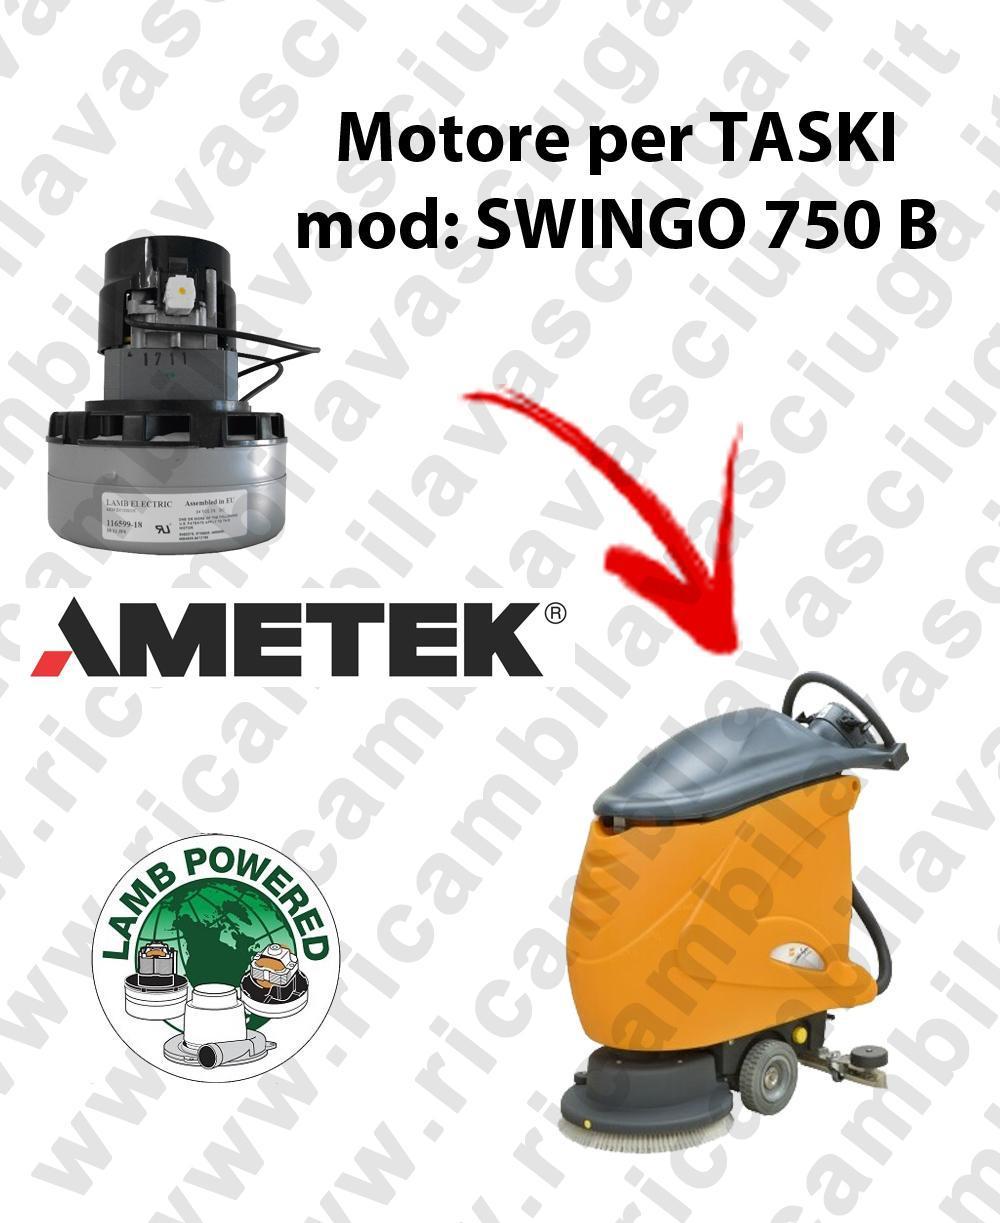 SWINGO 750 B MOTEUR ASPIRATION LAMB AMATEK pour autolaveuses TASKI